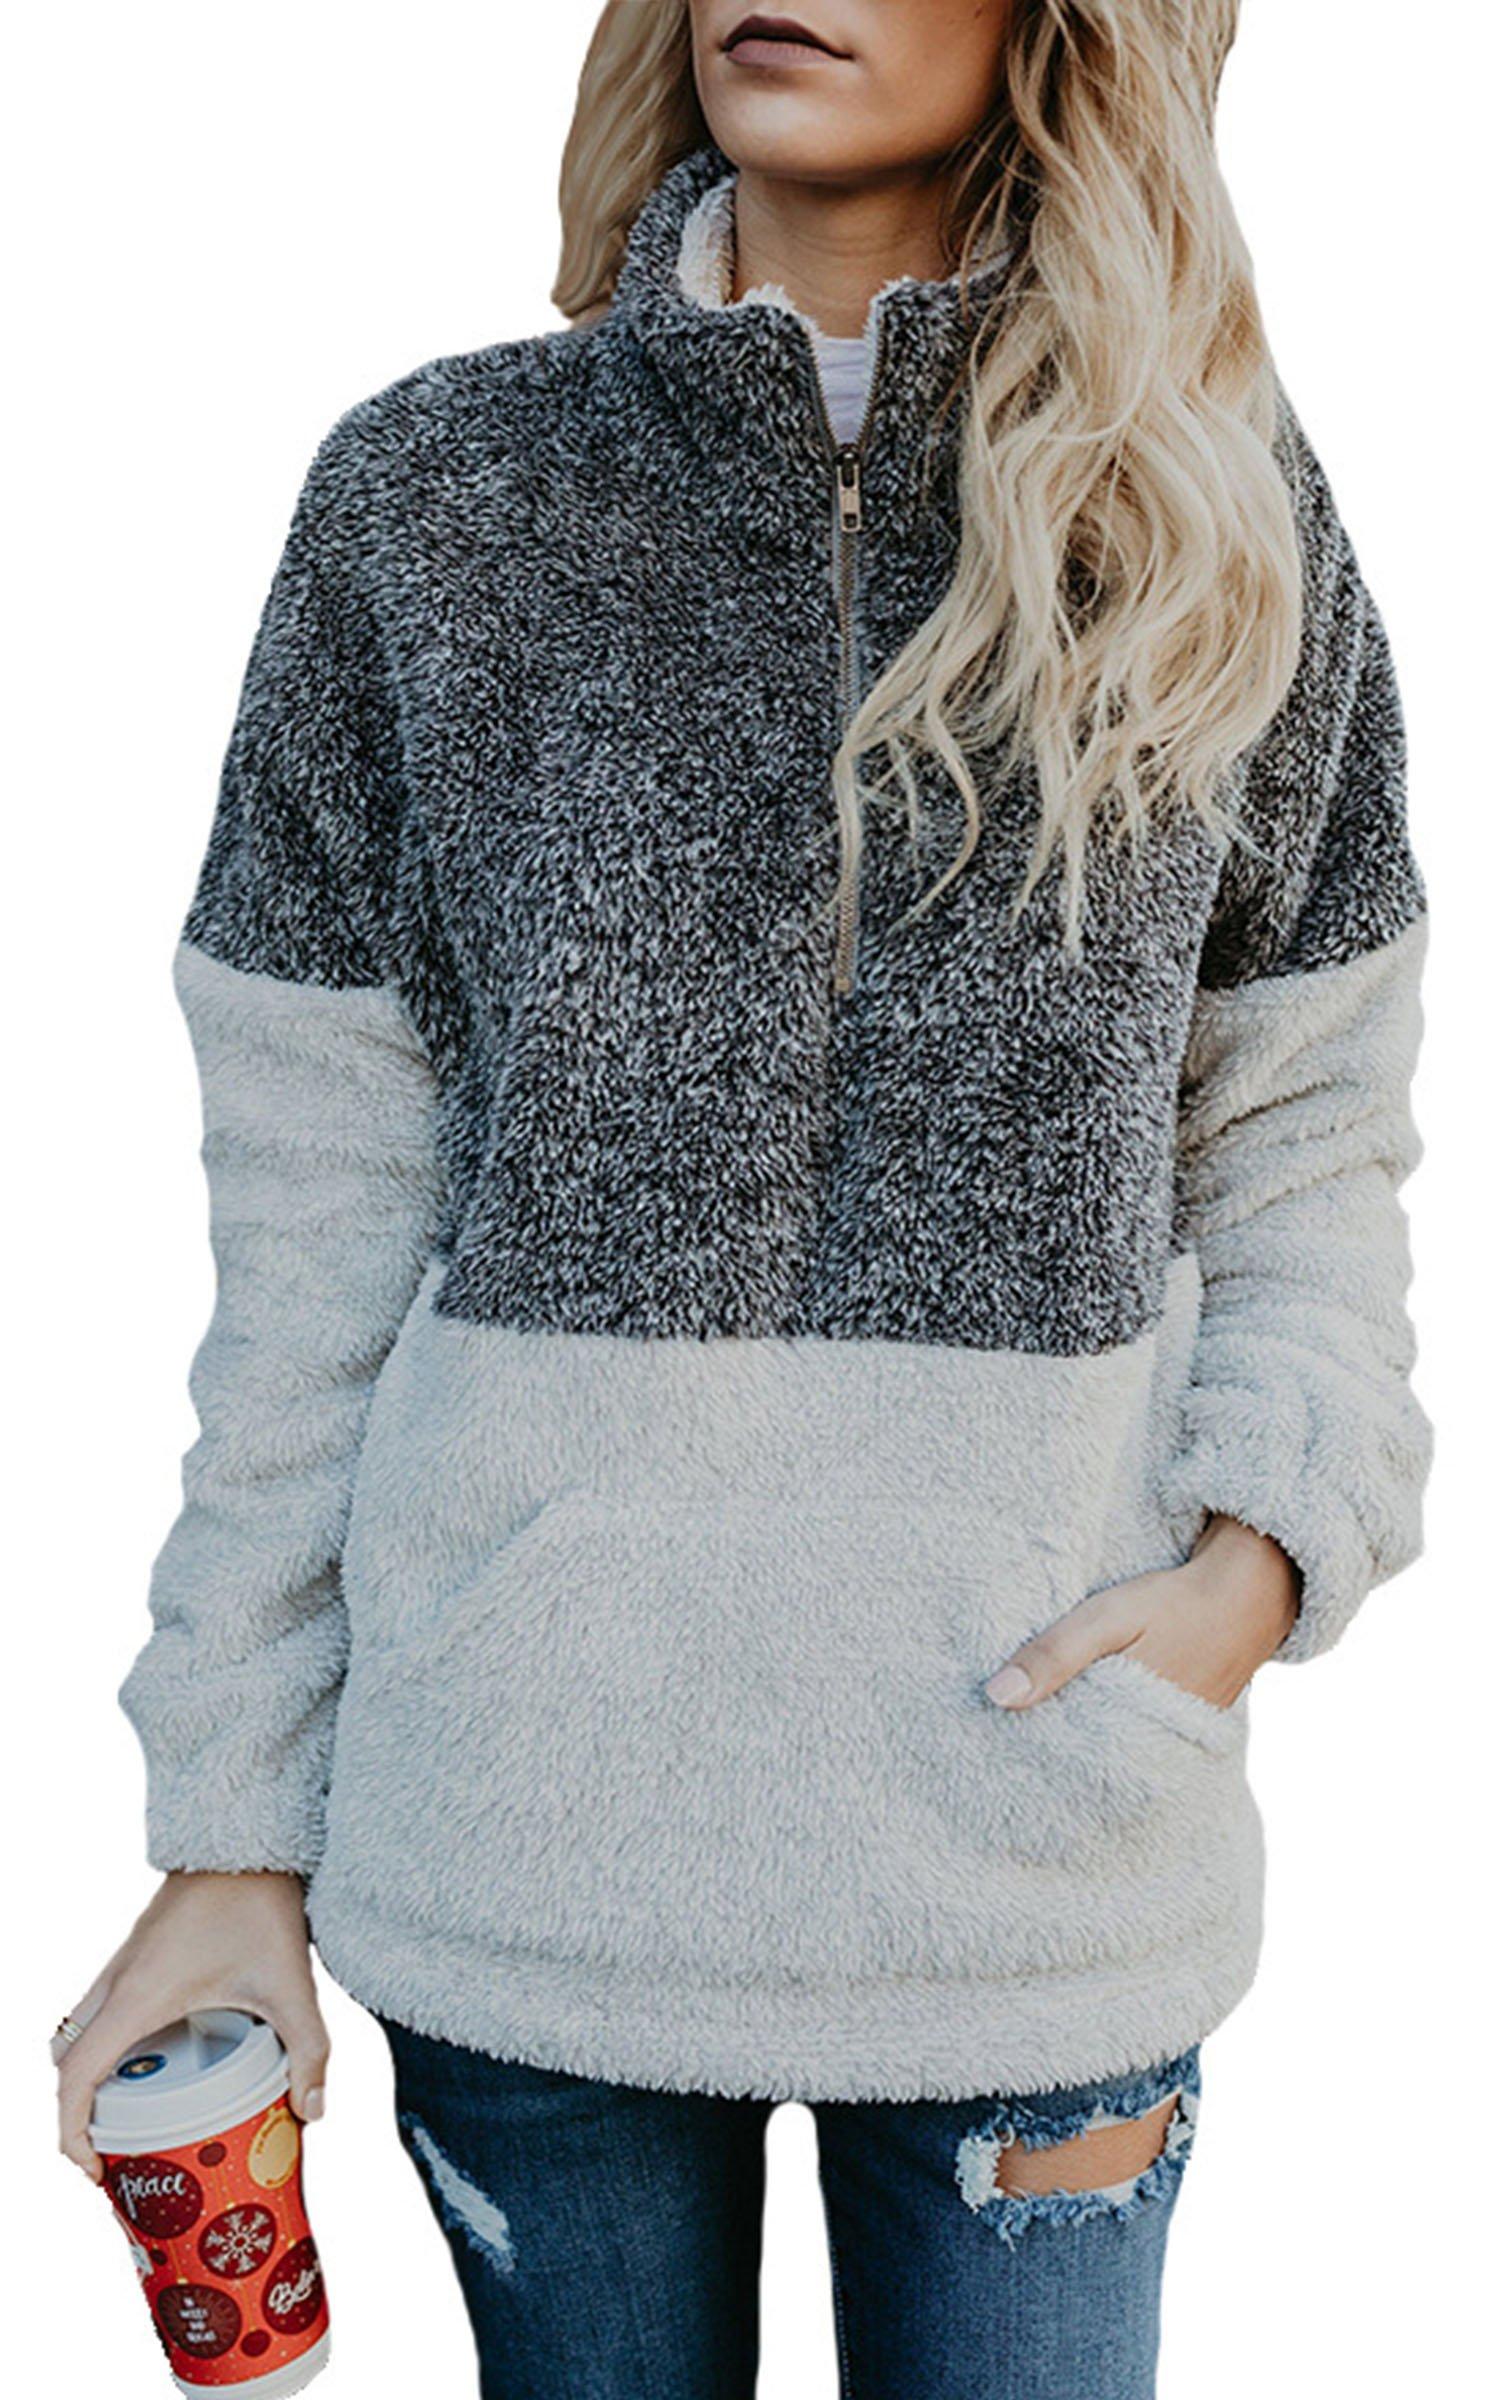 Angashion Womens Long Sleeve Half Zip Fuzzy Fleece Pullover Jacket Outwear Sweatshirt Tops Coat with Pocket Black Grey L